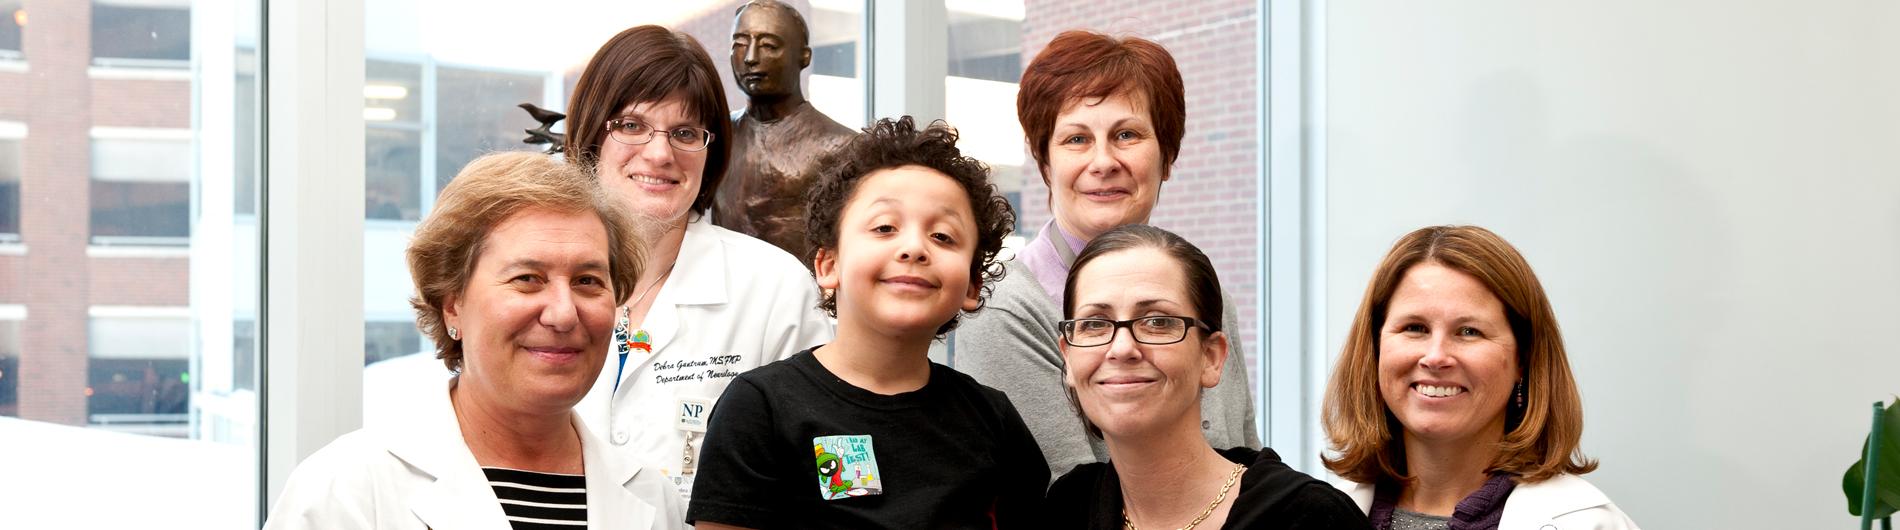 Neurology - University of Rochester Medical Center